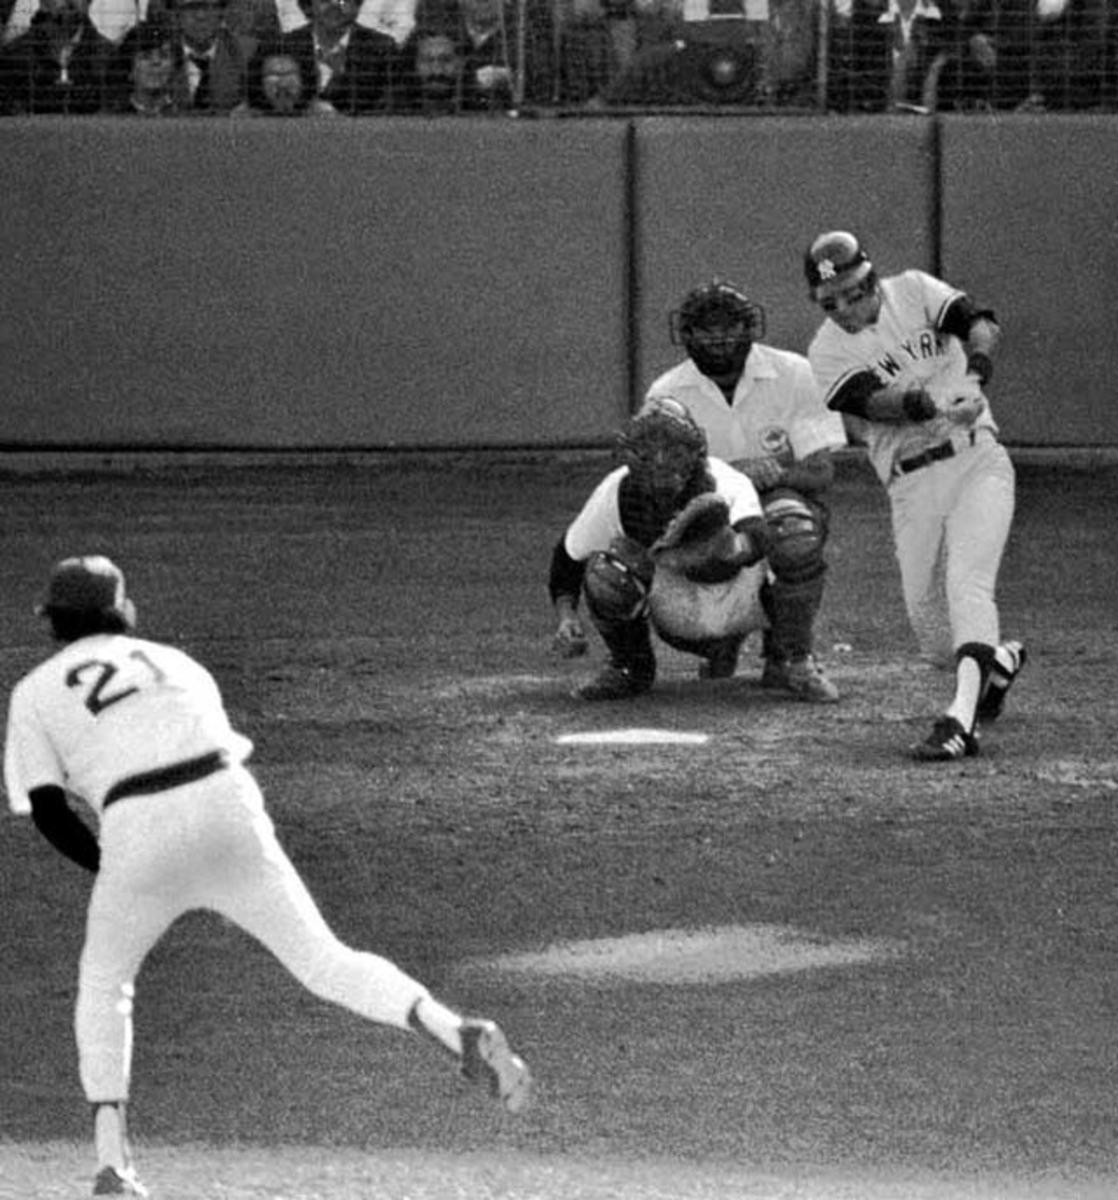 1978 American League East